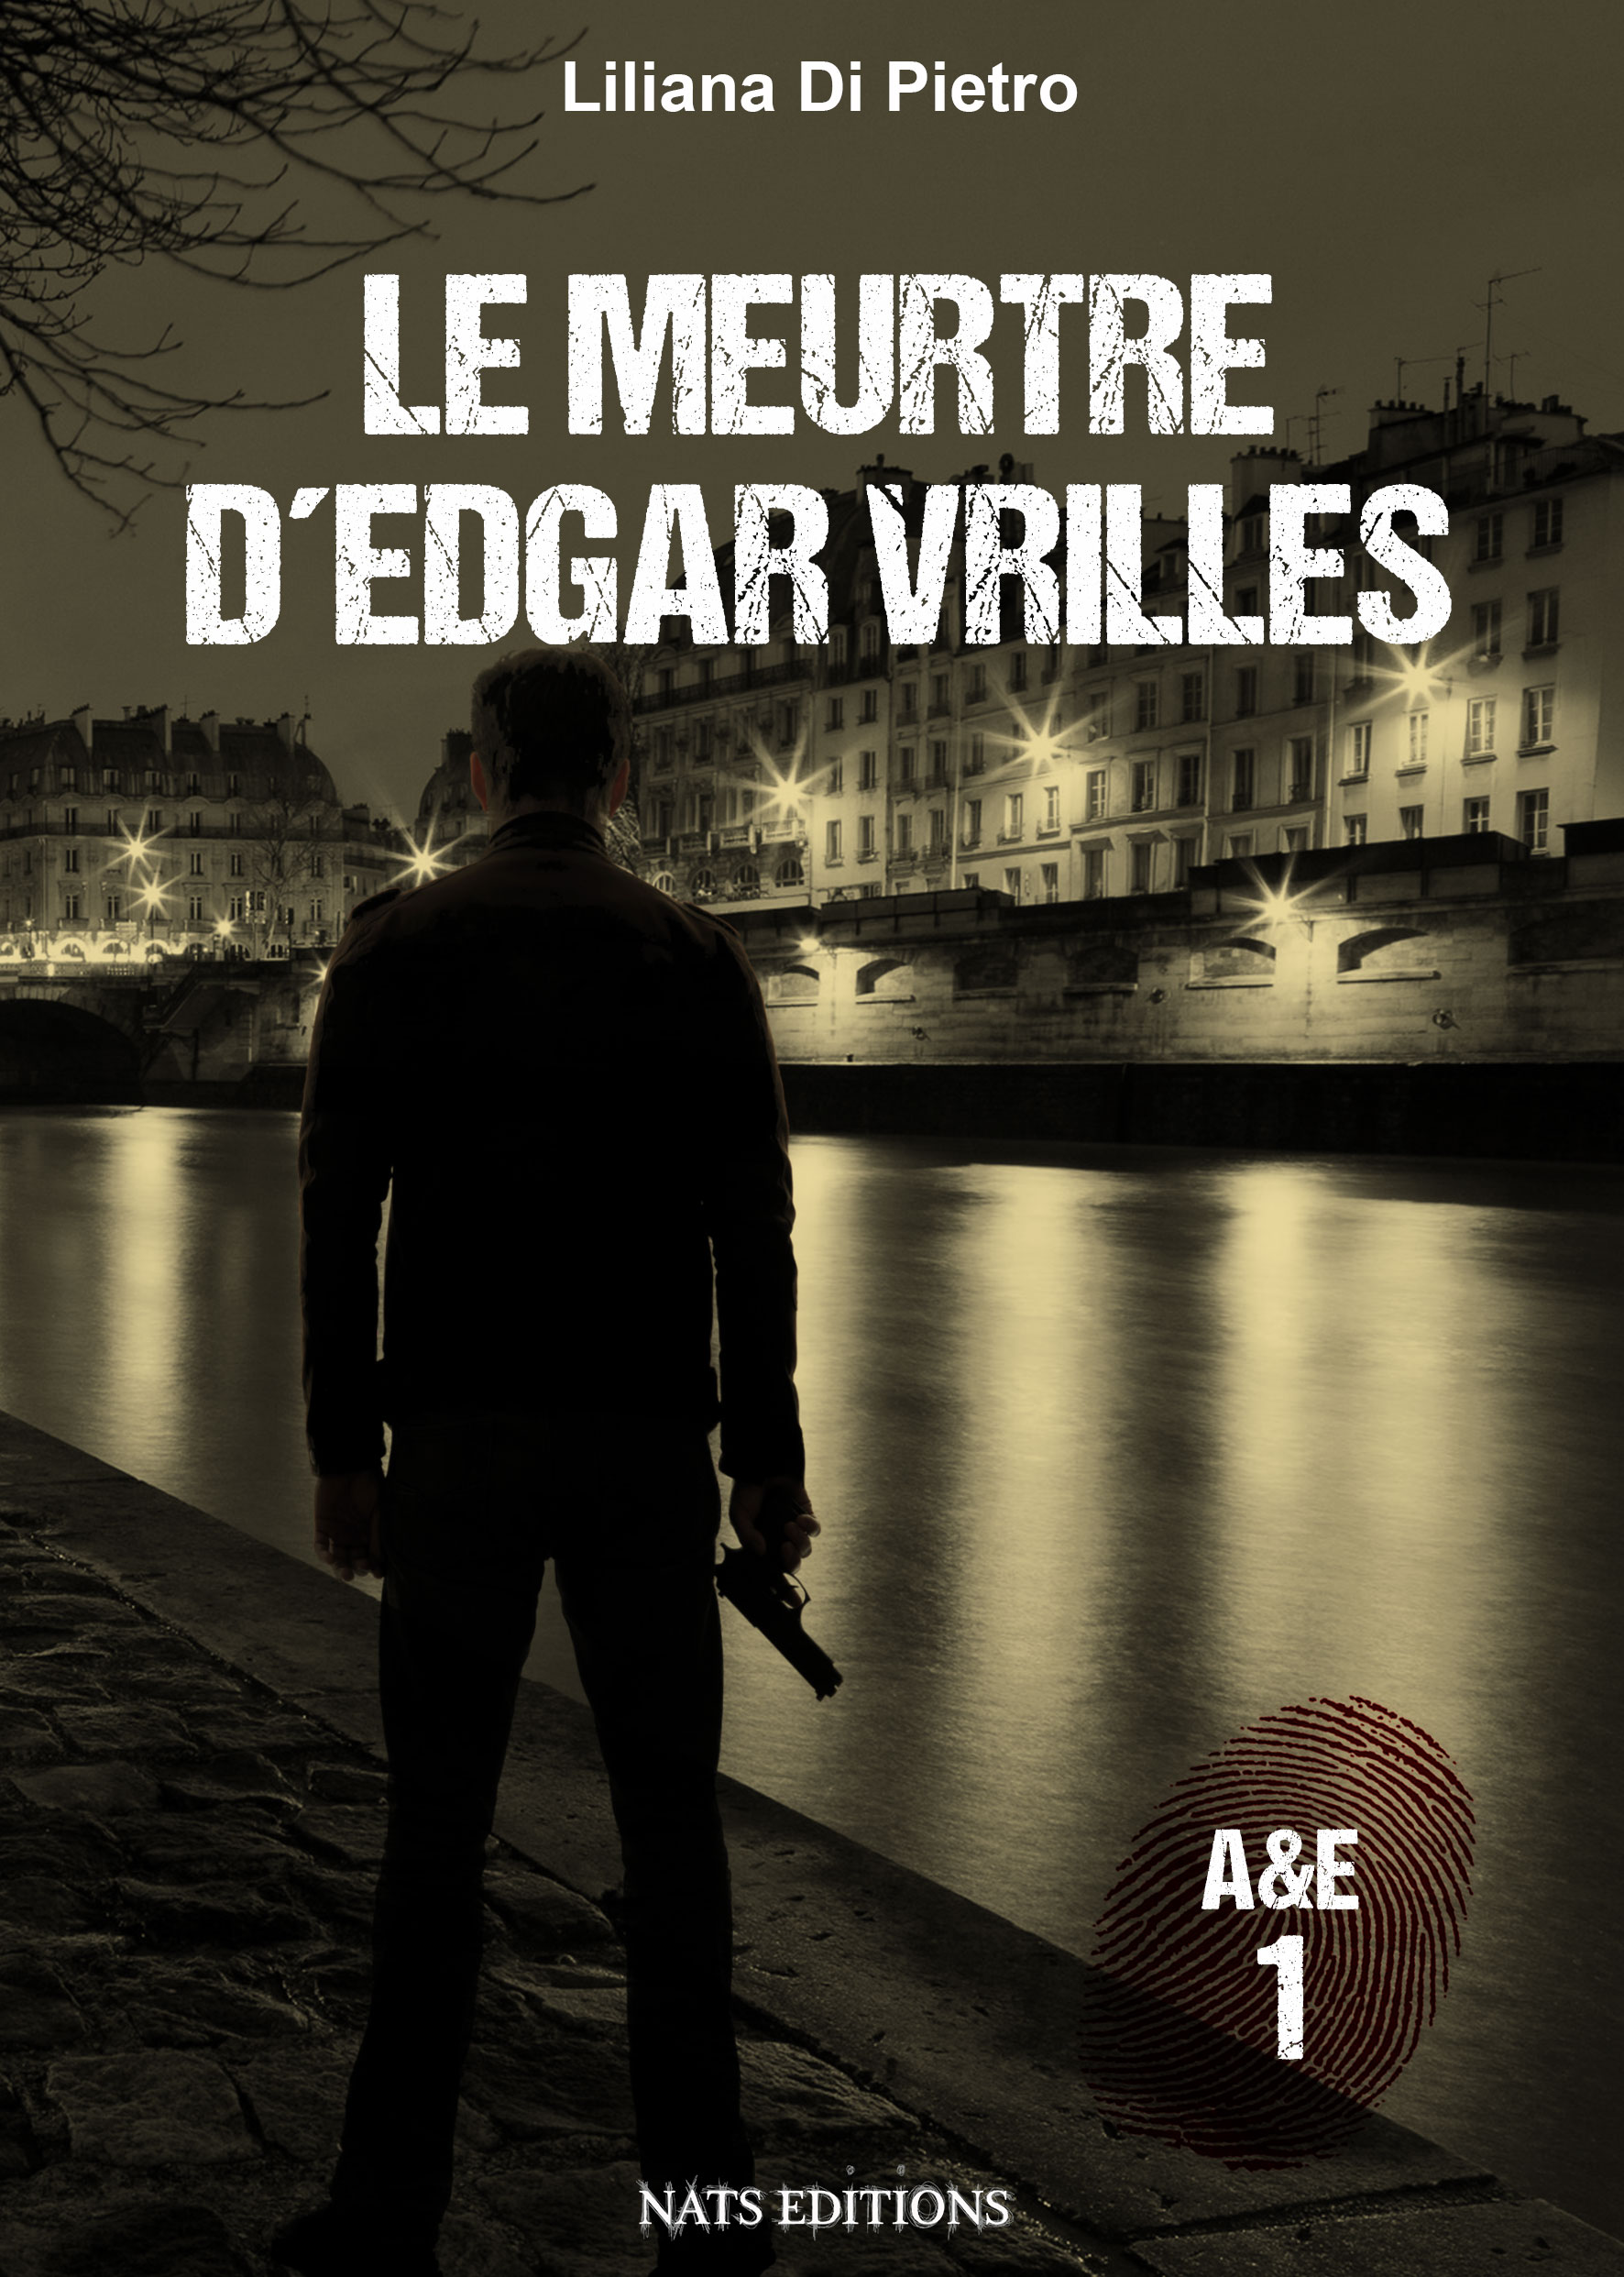 Le meurtre d'Edgar Vrilles.jpg